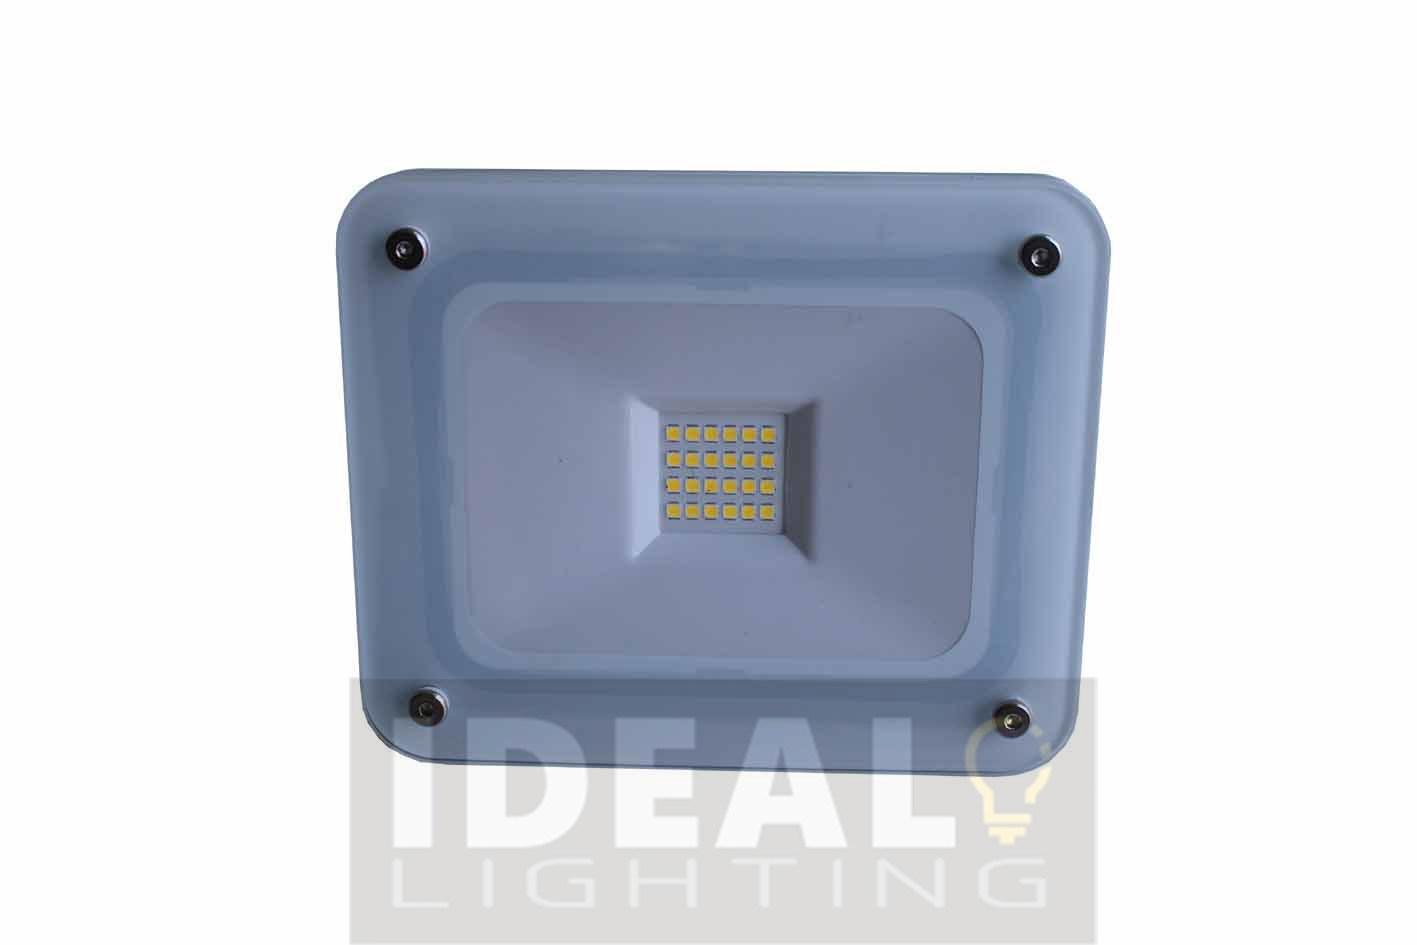 10W LED Ultrathin Floodlight